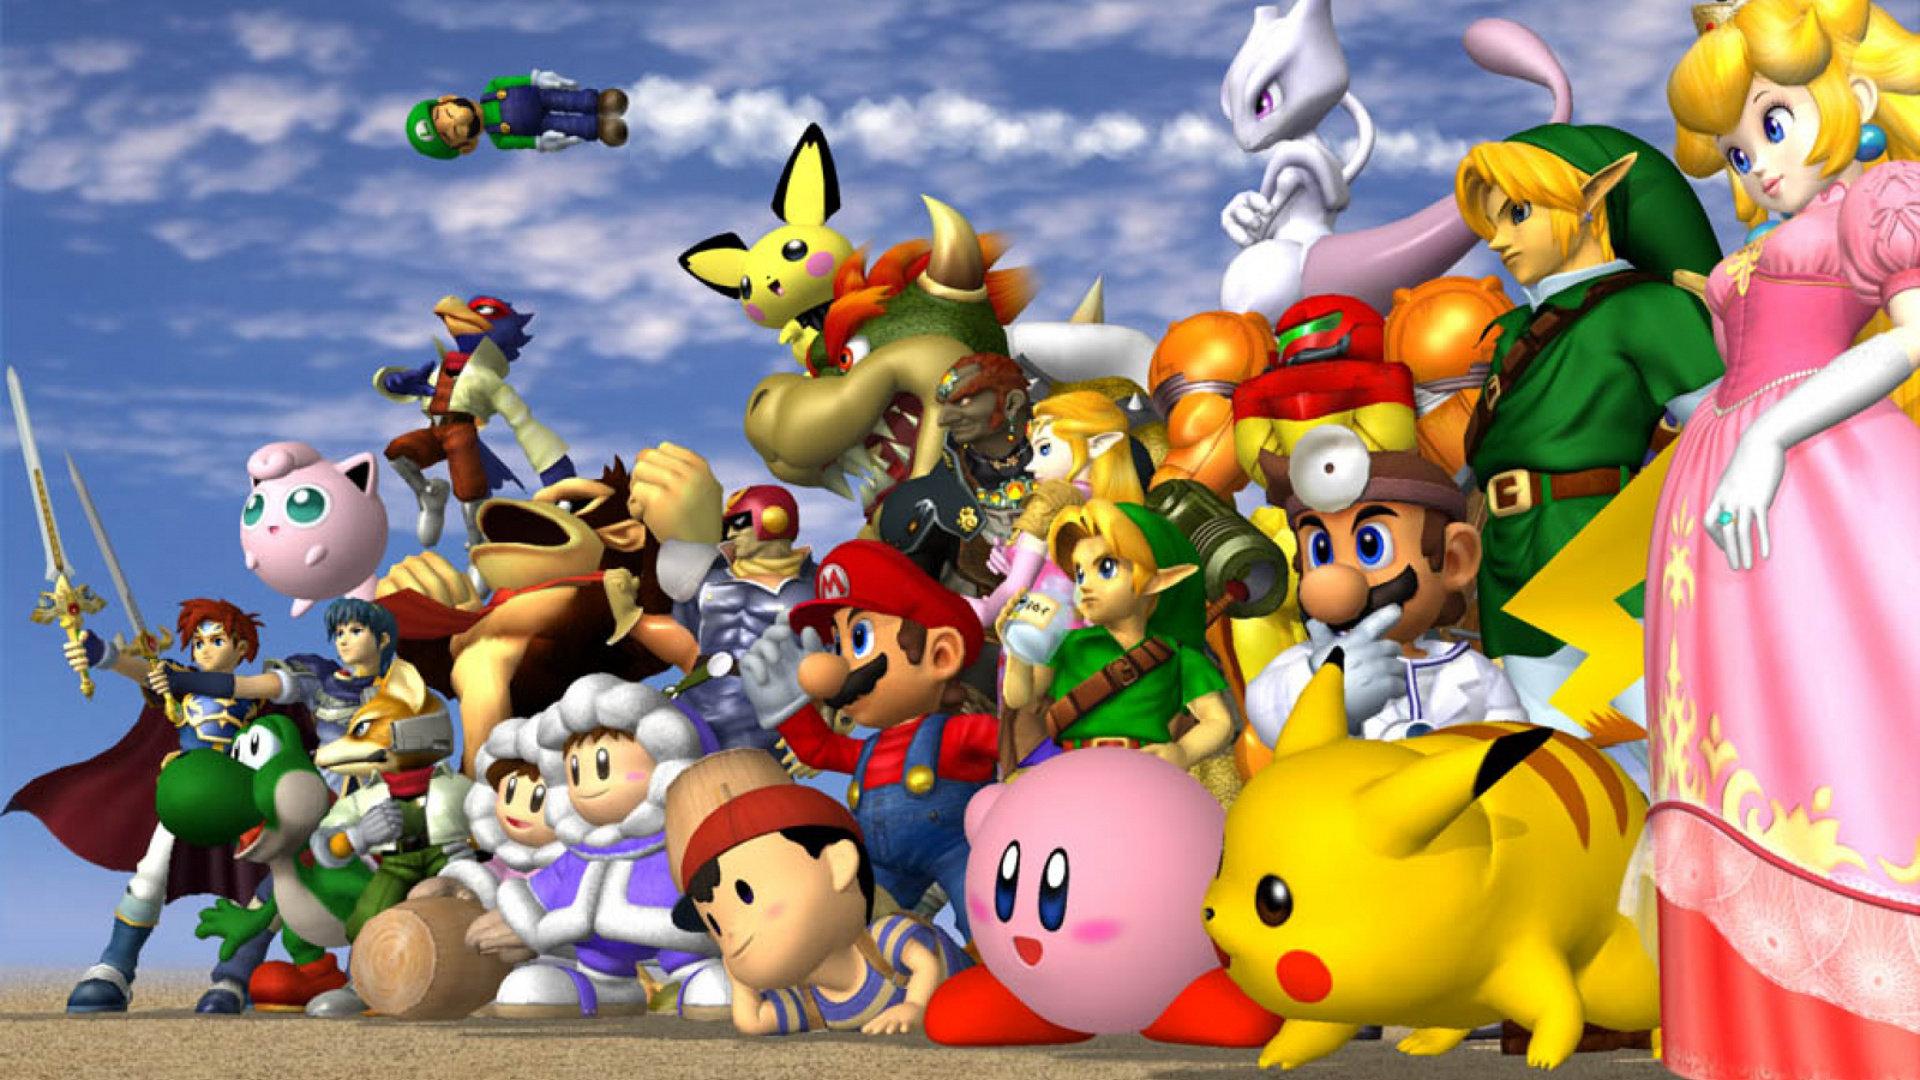 Awesome Super Smash Bros Super Smash Bros Melee 1934759 Hd